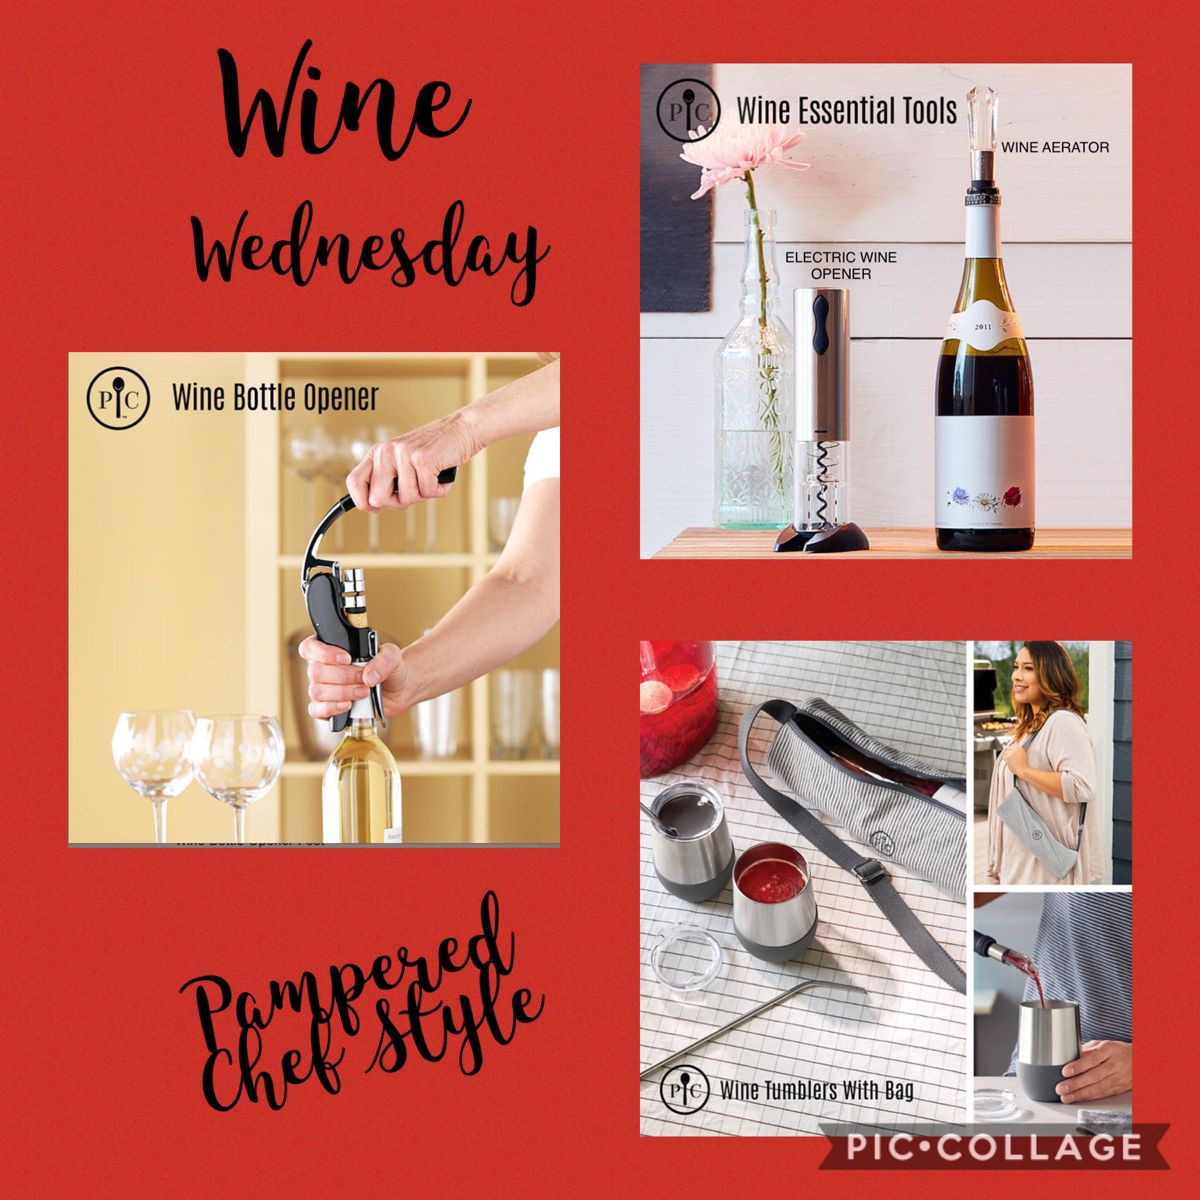 Pin By Elizabeth Barnes On Pc Wine Wednesday Posts In 2020 Electric Wine Opener Wine Bottle Opener Wine Aerators